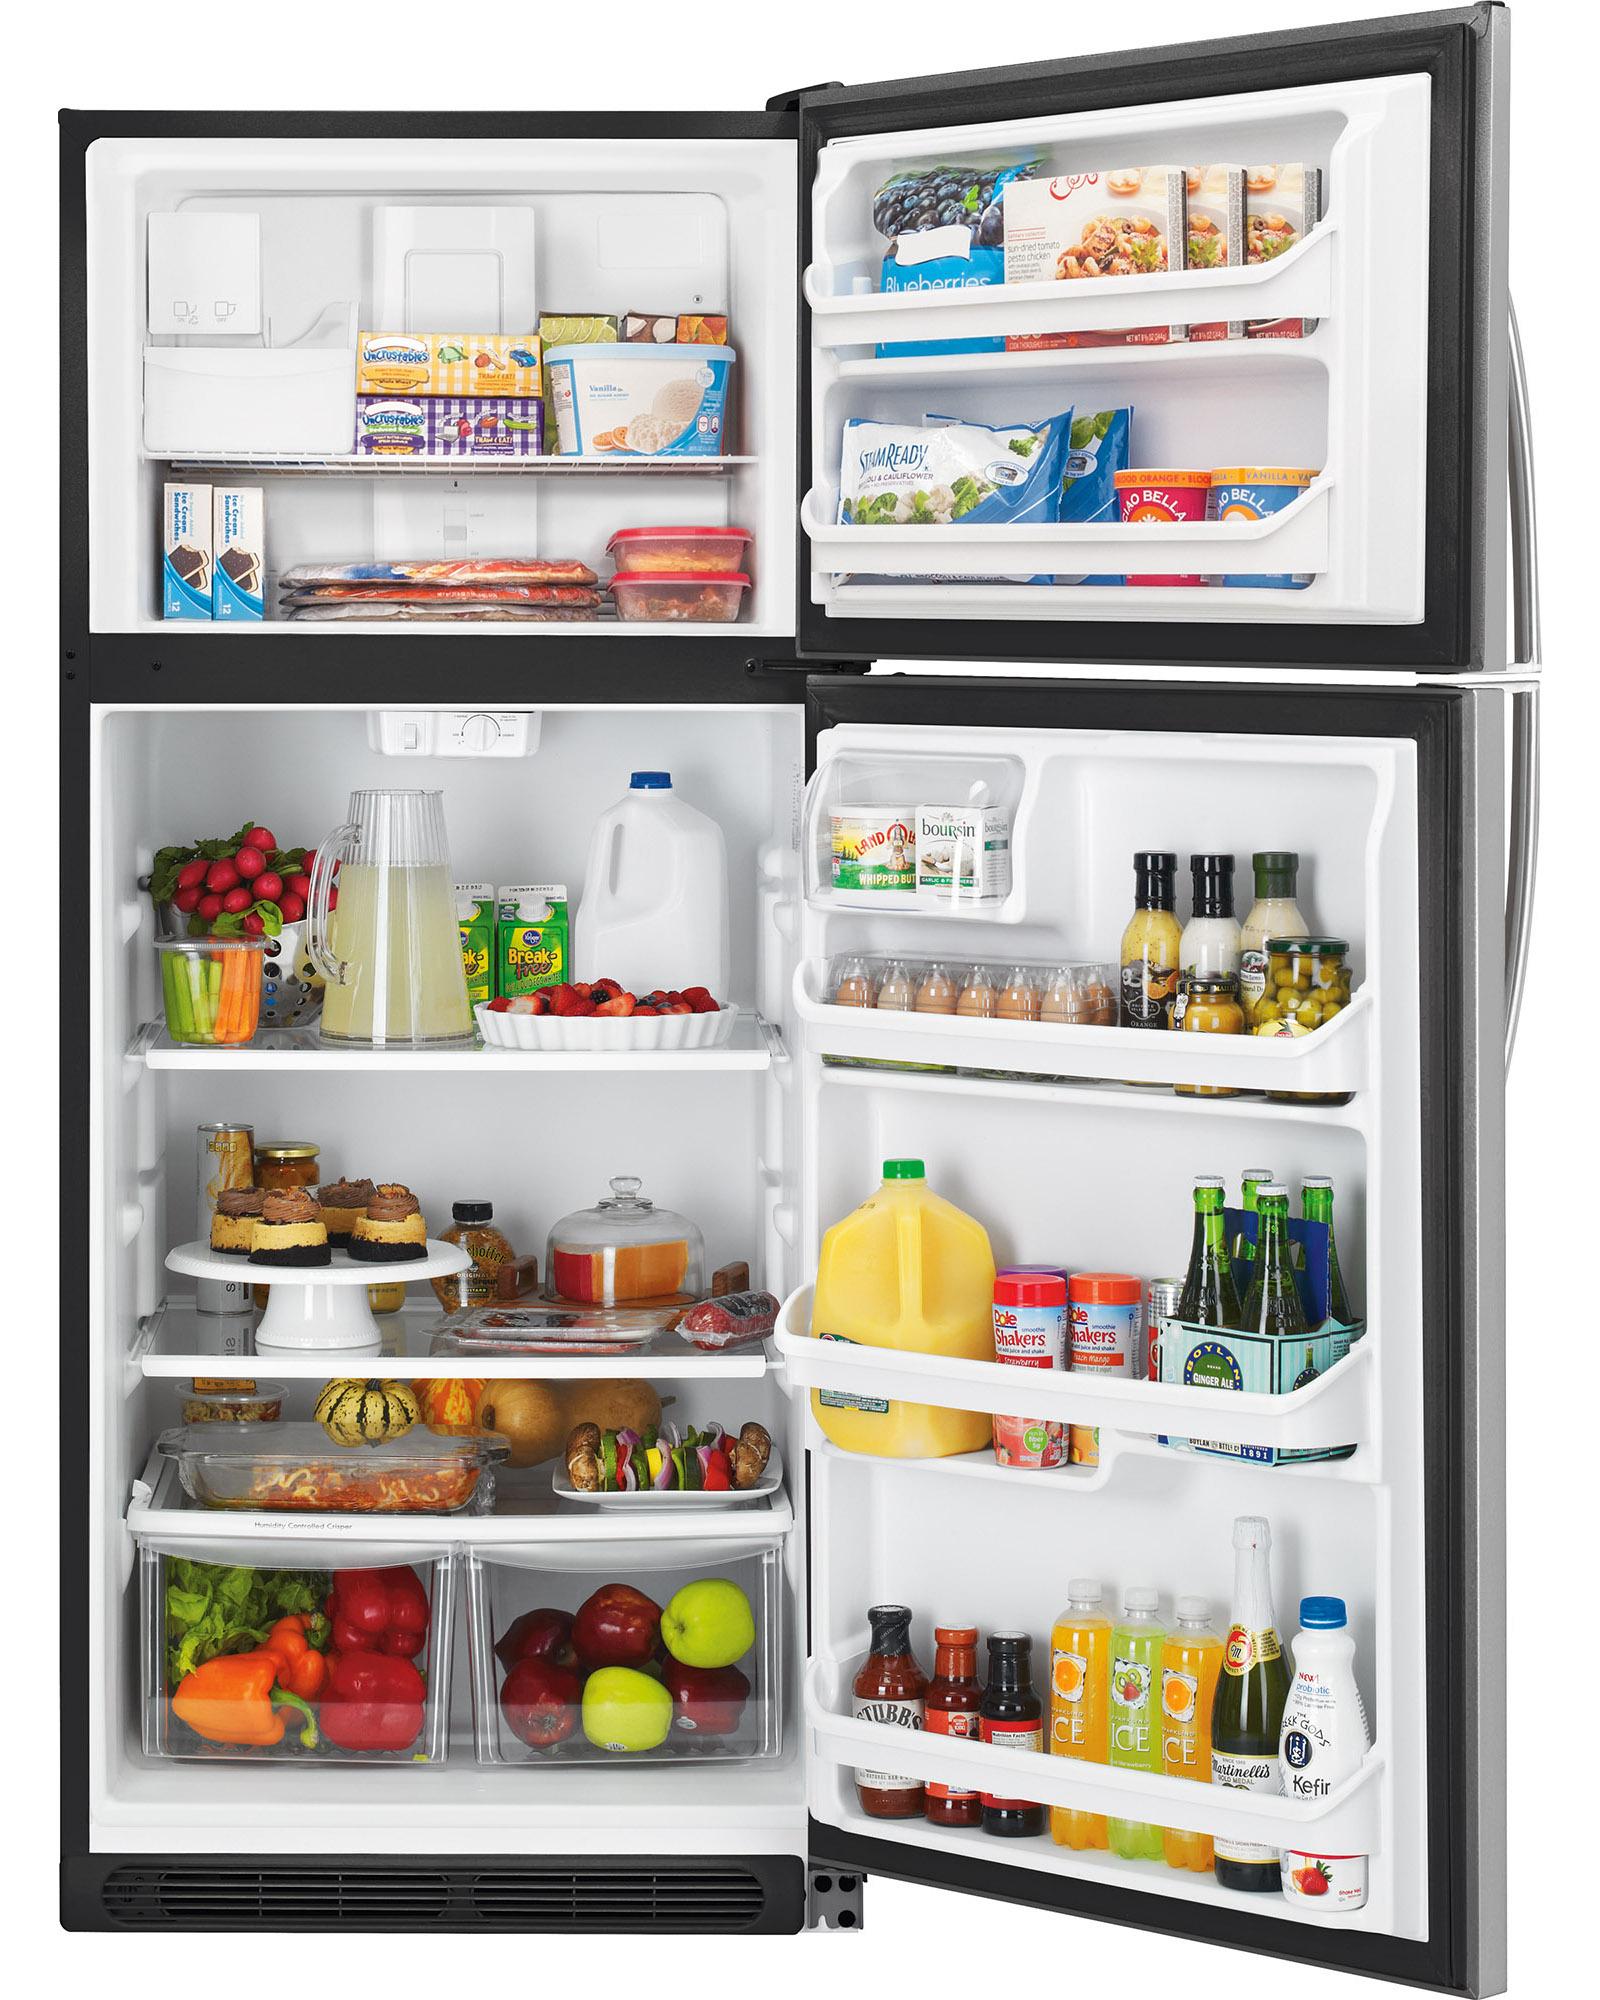 Kenmore 20.4 cu. ft. Top Freezer Refrigerator - Stainless Steel